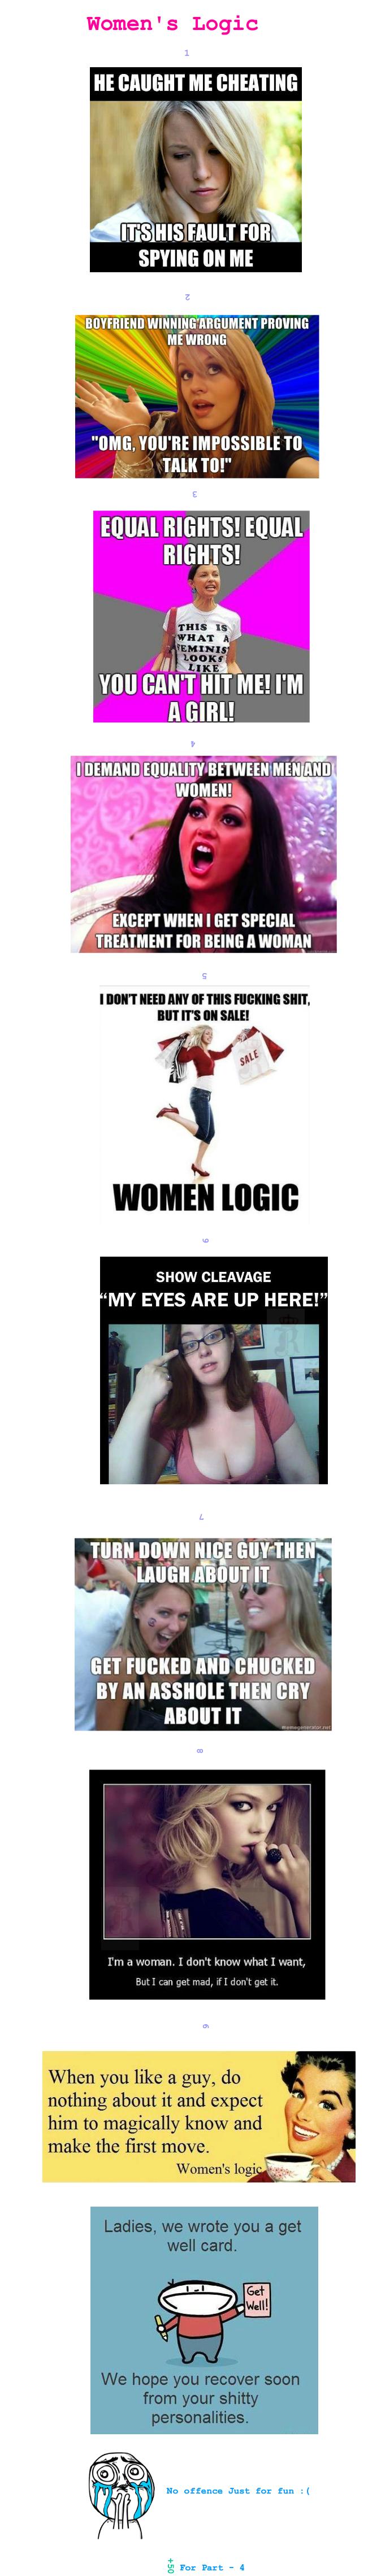 Women's Logic - 3. Link to part -2 www.funnyjunk.com/funny_pictures/3835200/Women+s+Logic+Part+two+D/ Link to part -1 ;) www.funnyjunk.com/funny_pictures/382479